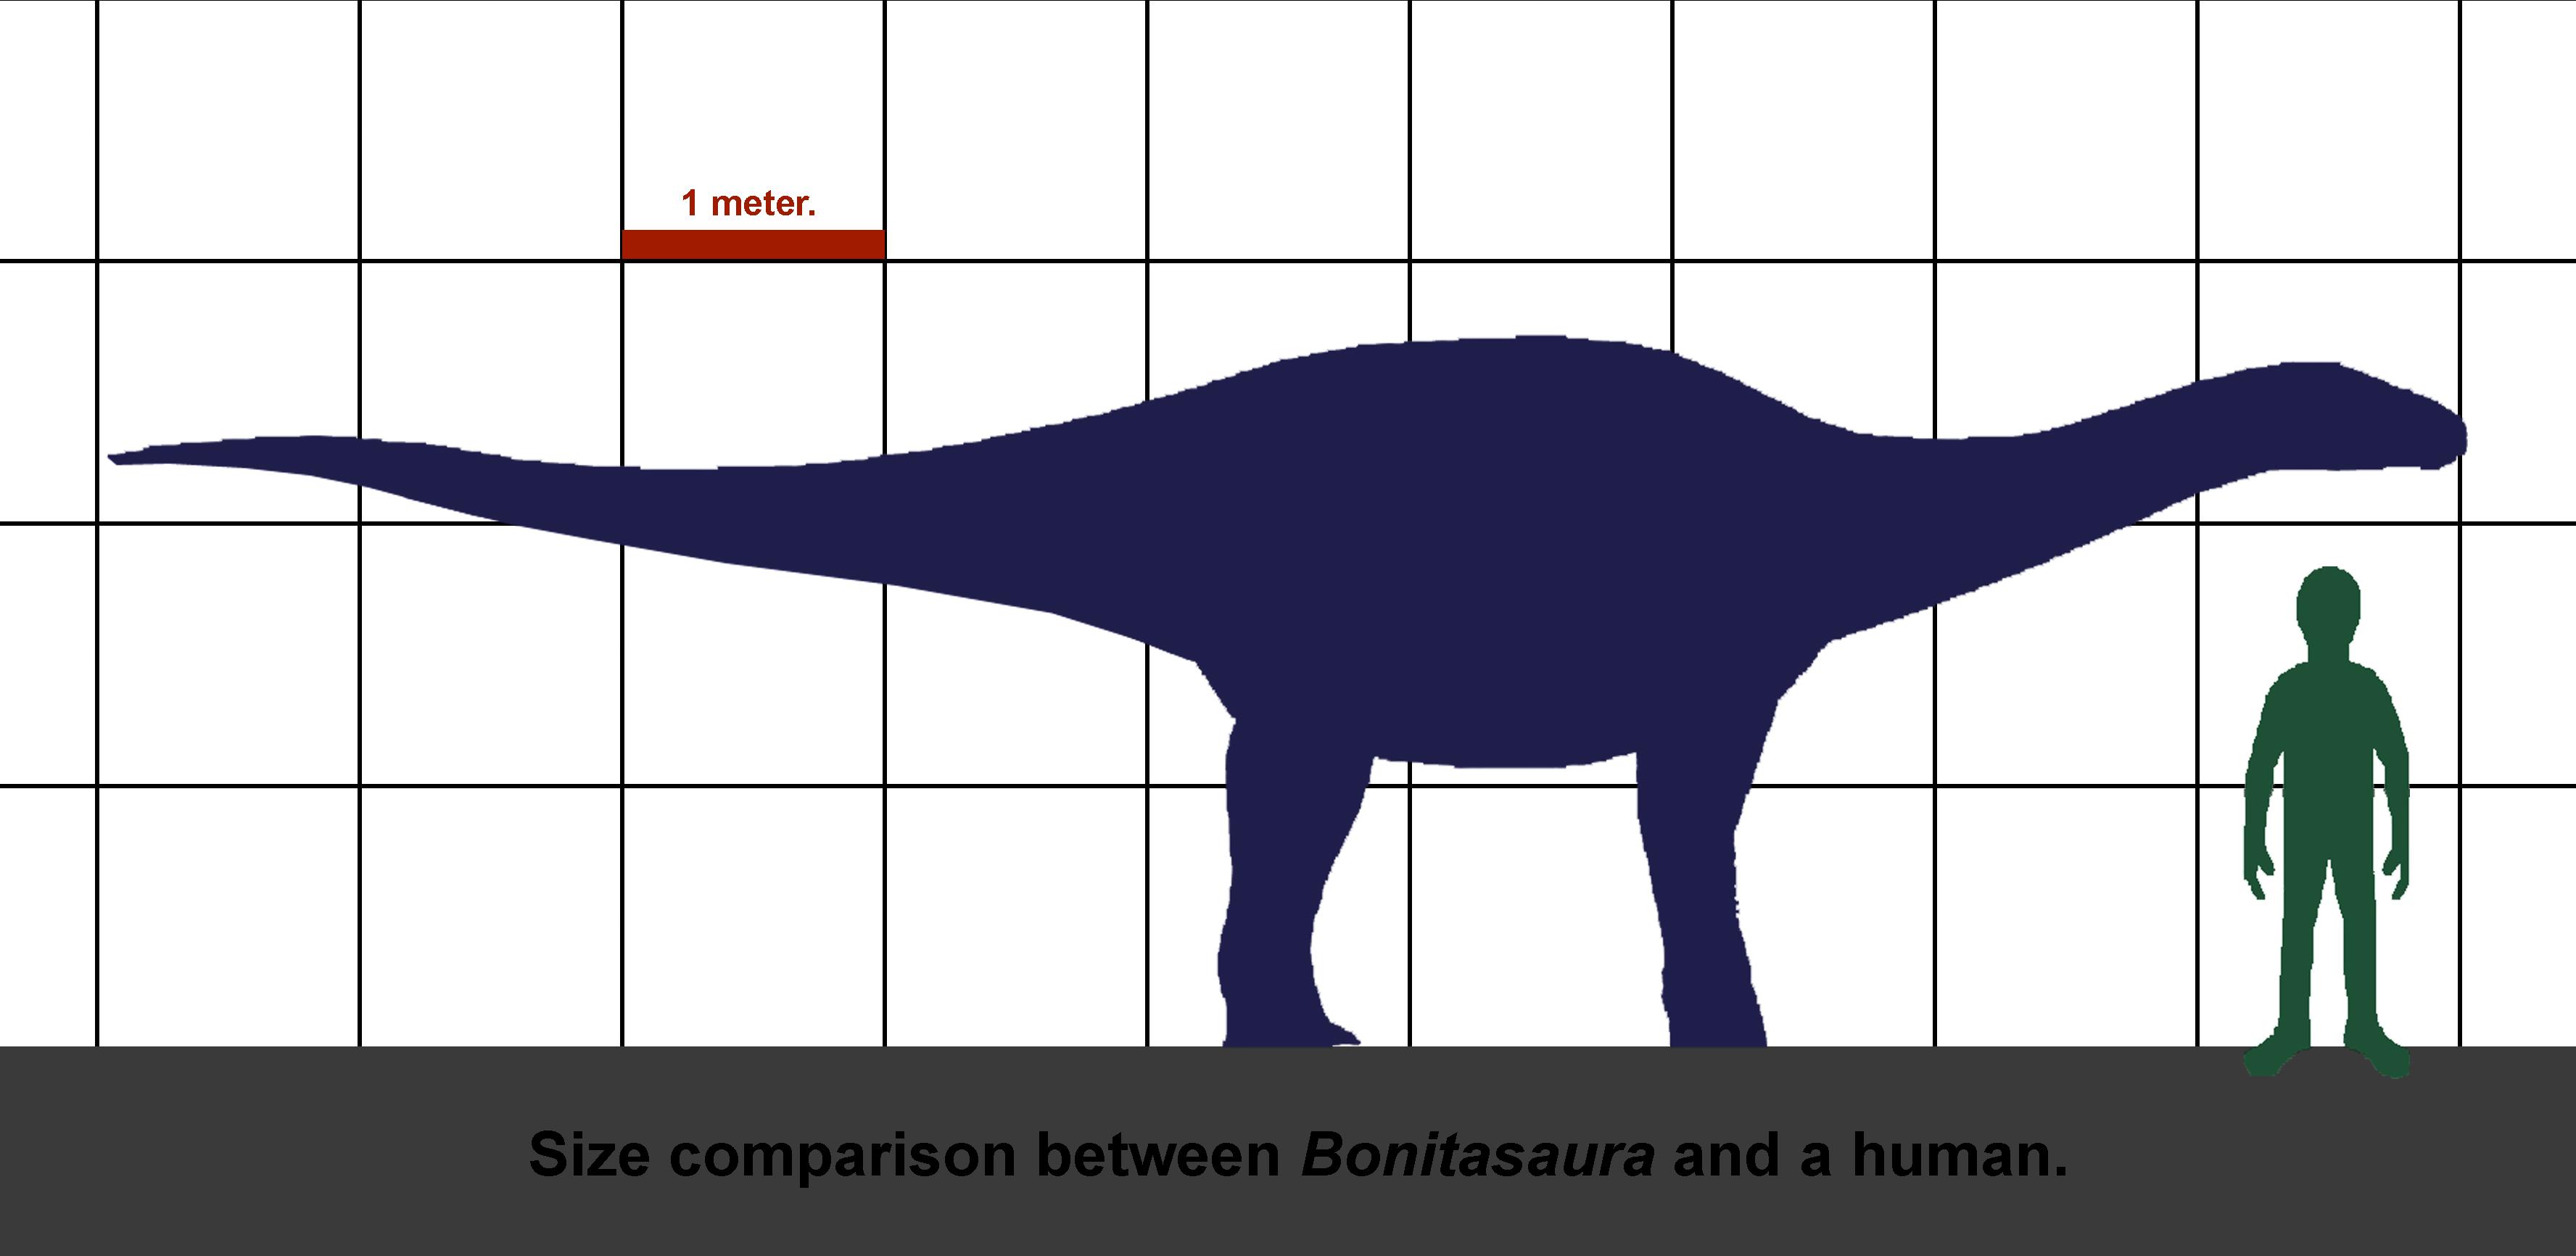 File:Bonitasaura-human size.jpg - Wikimedia Commons